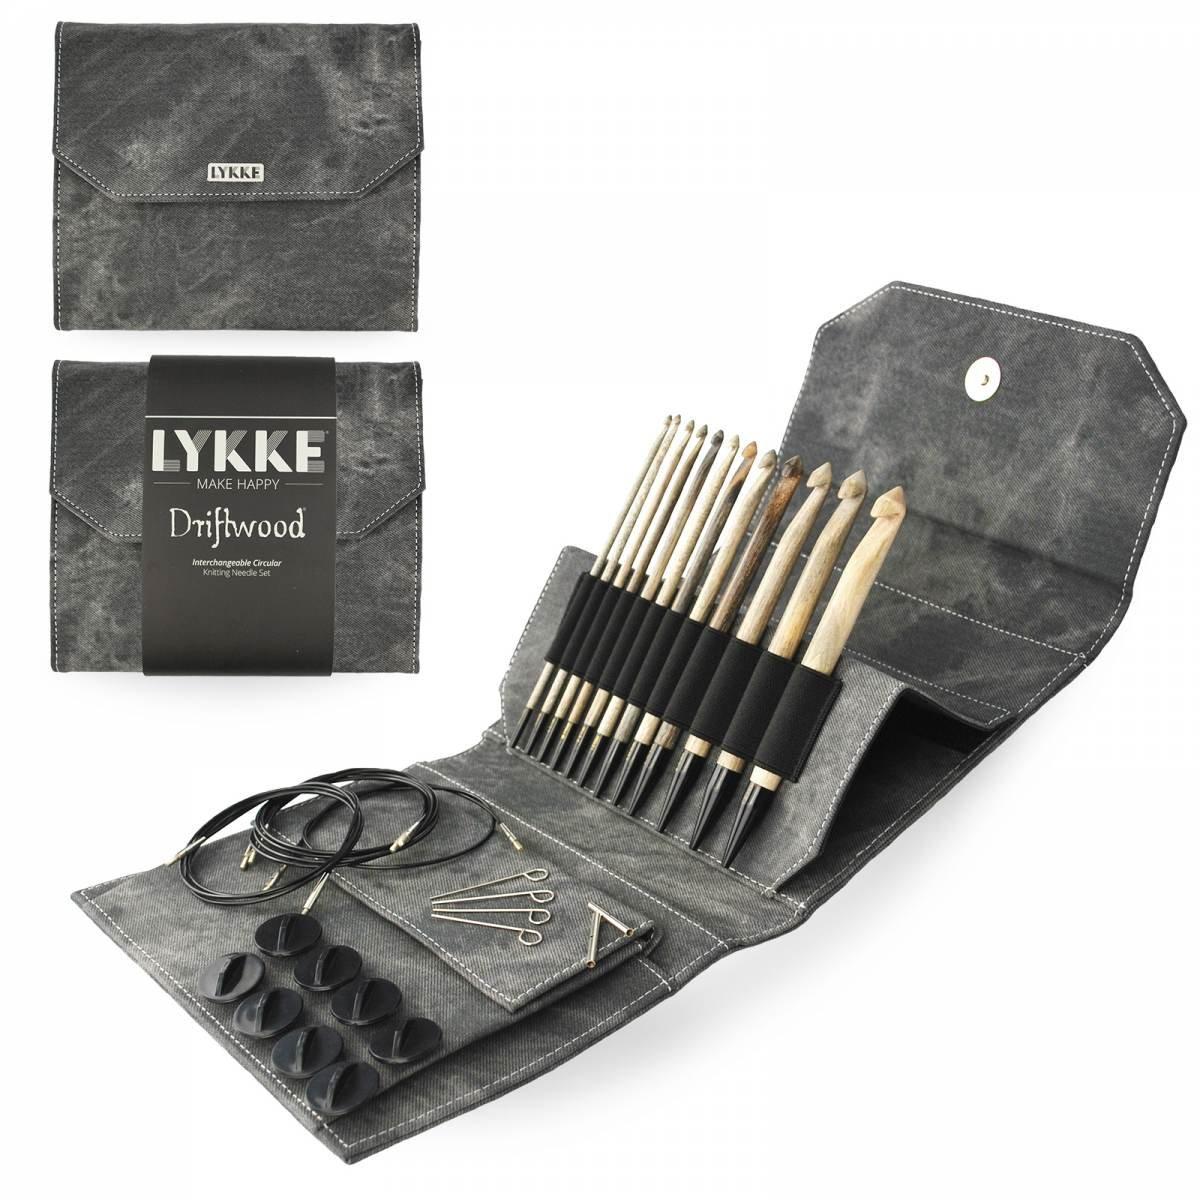 Lykke Driftwood 6 IC (Tunisian) Crochet Hook Set